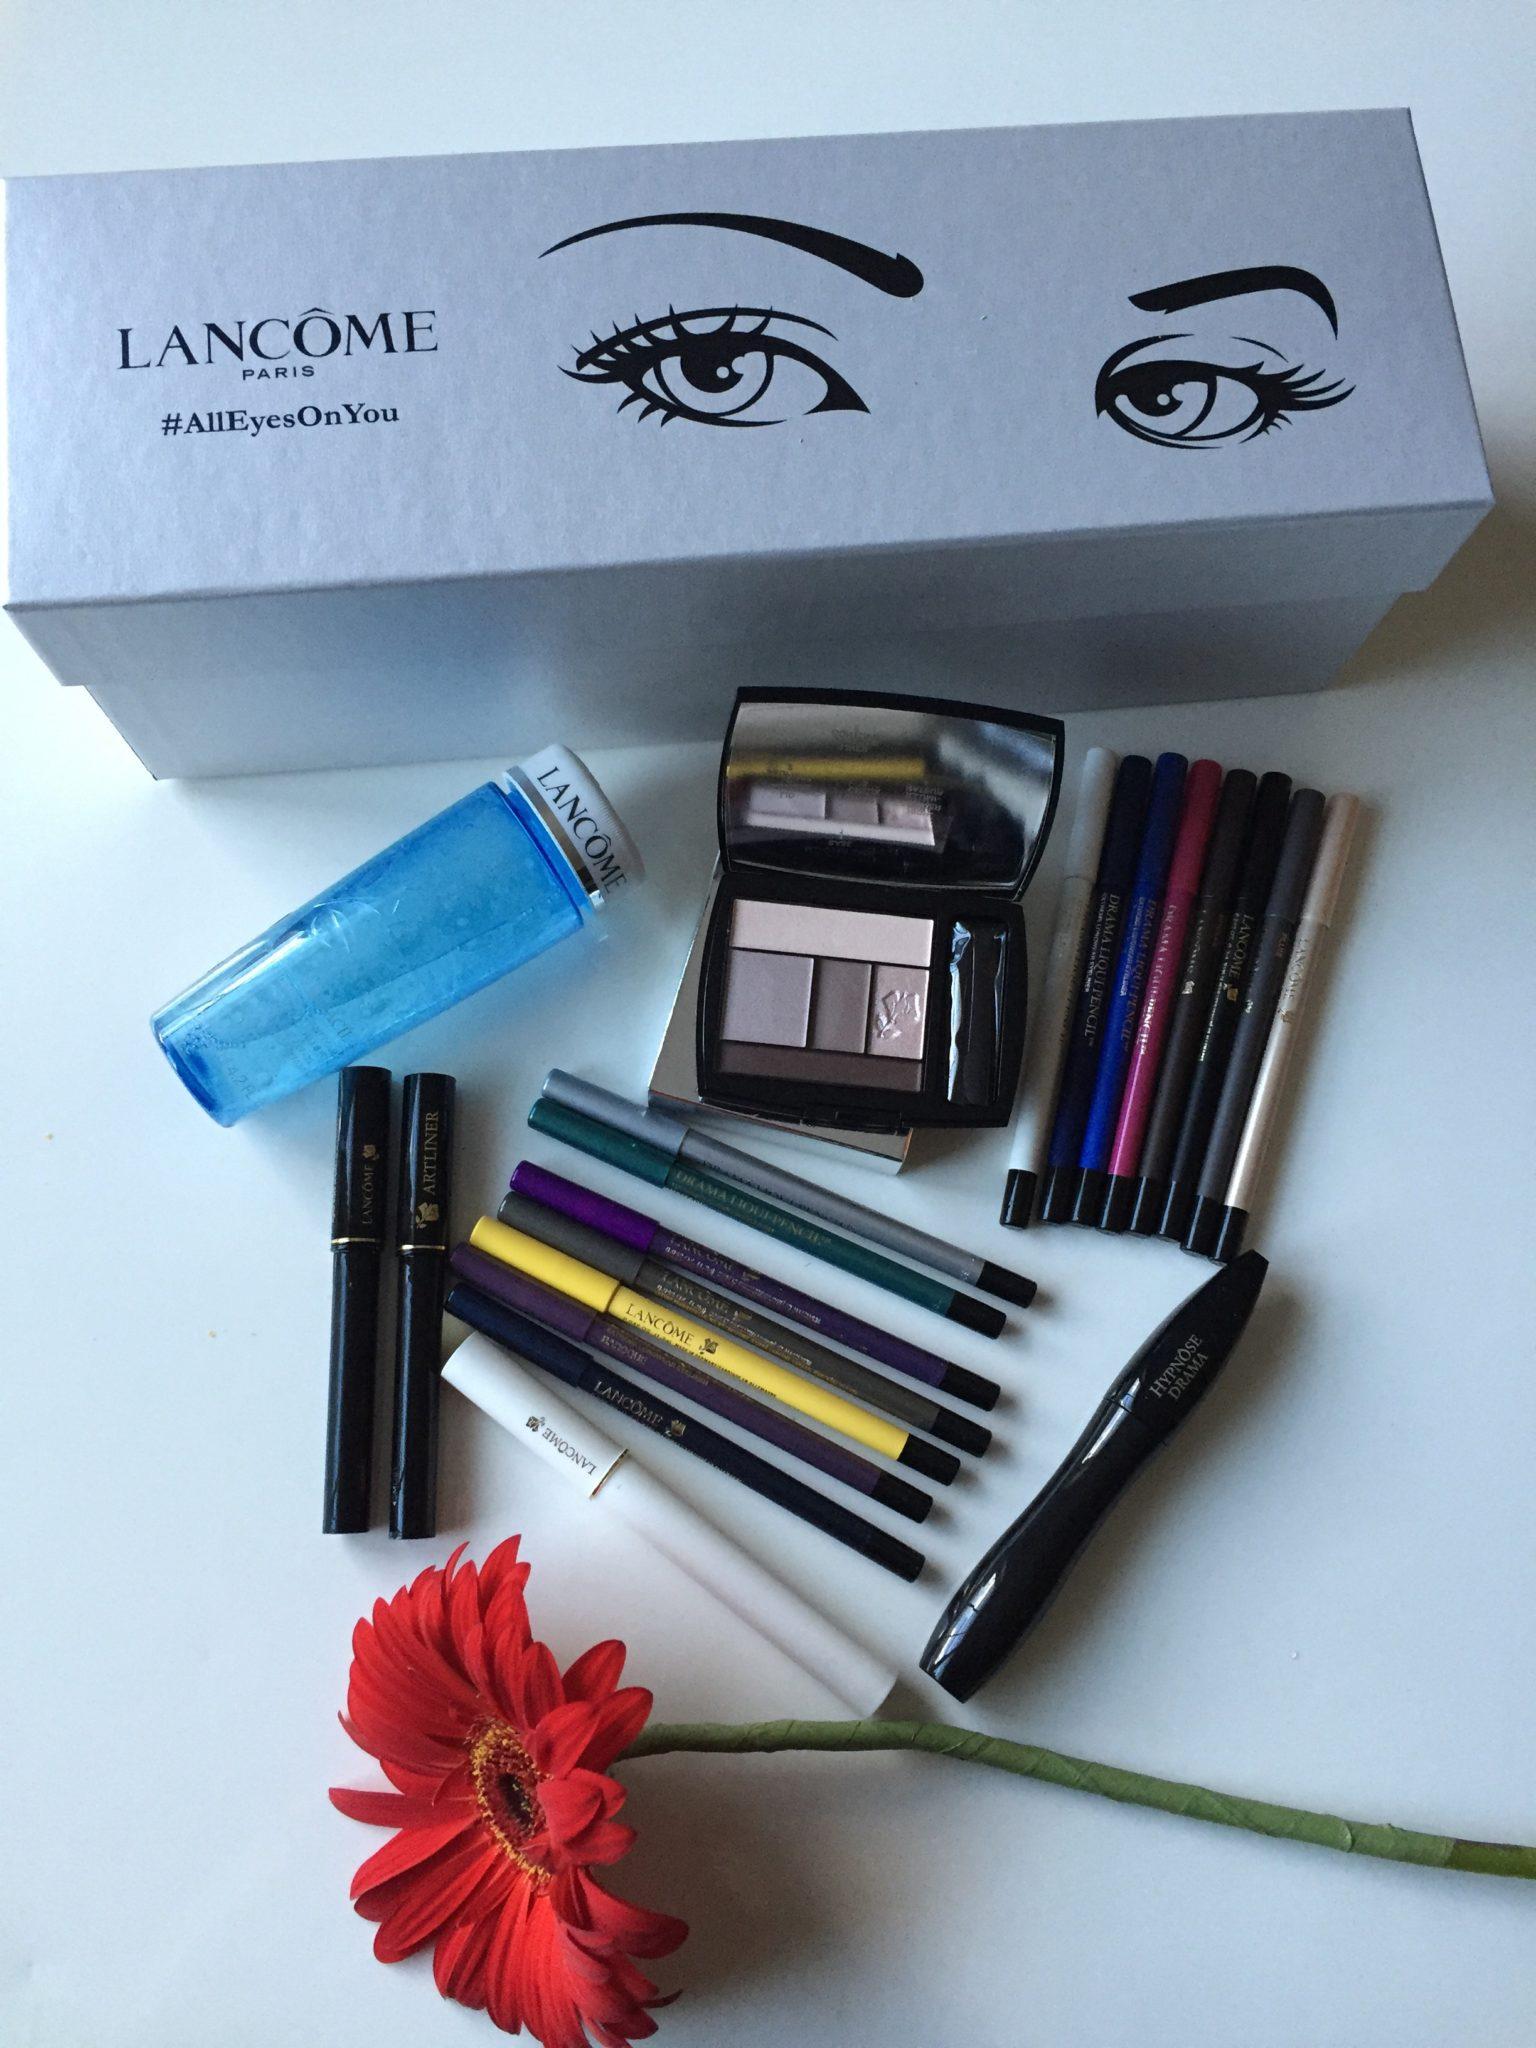 Lancôme Paris #AllEyesOnYou Collection